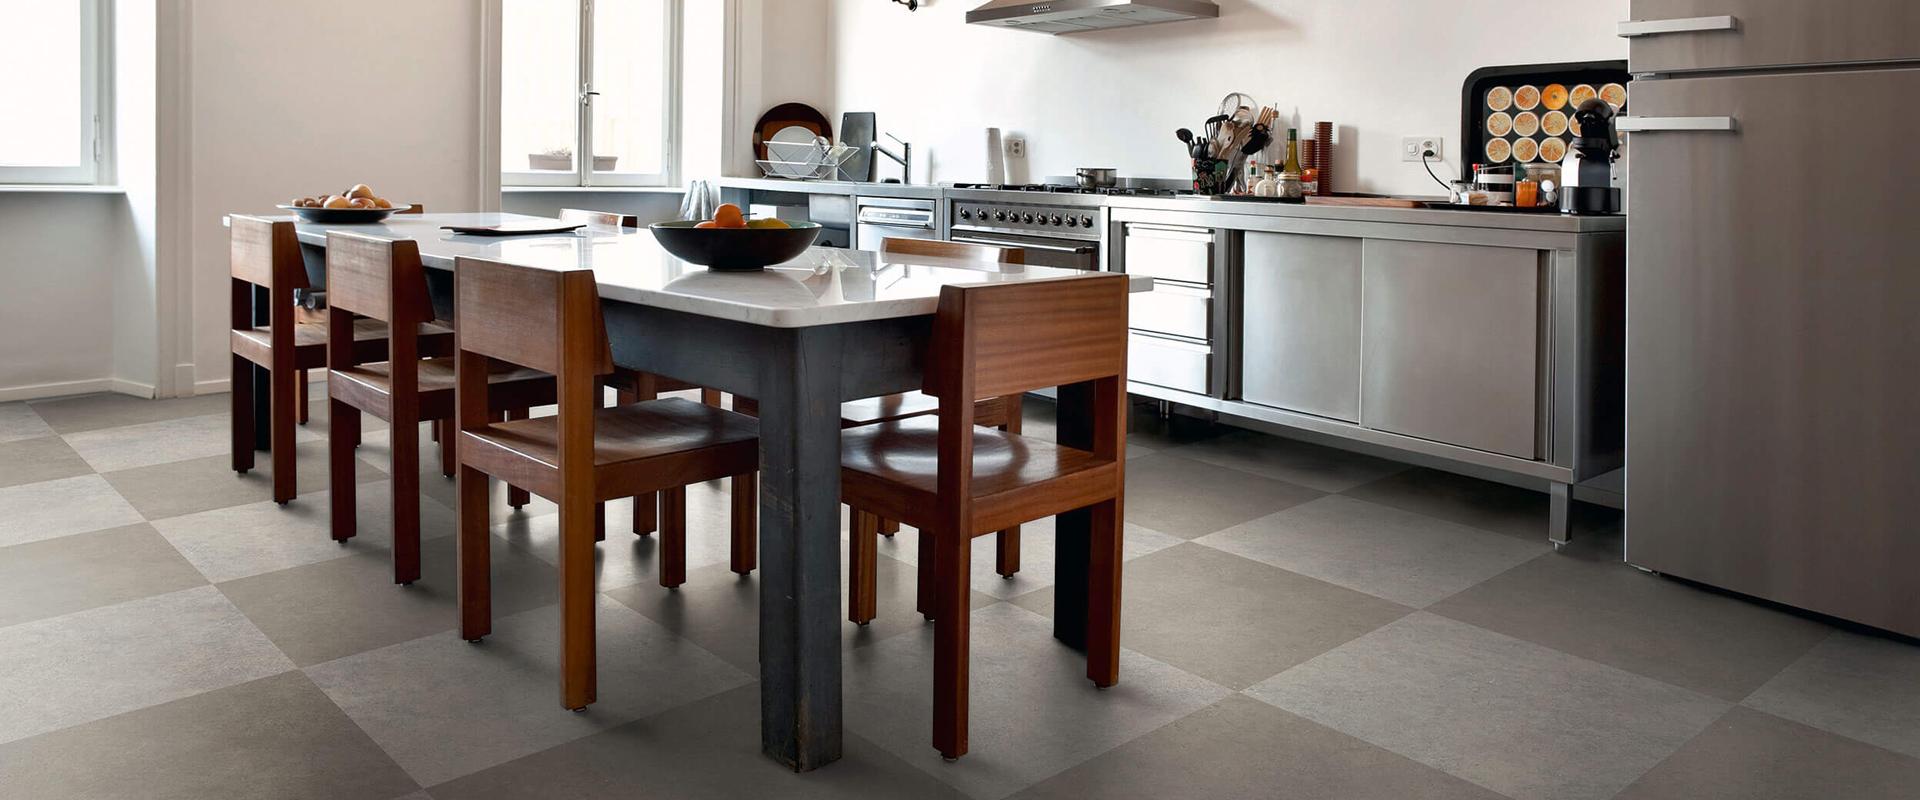 De juiste vloer in de keuken